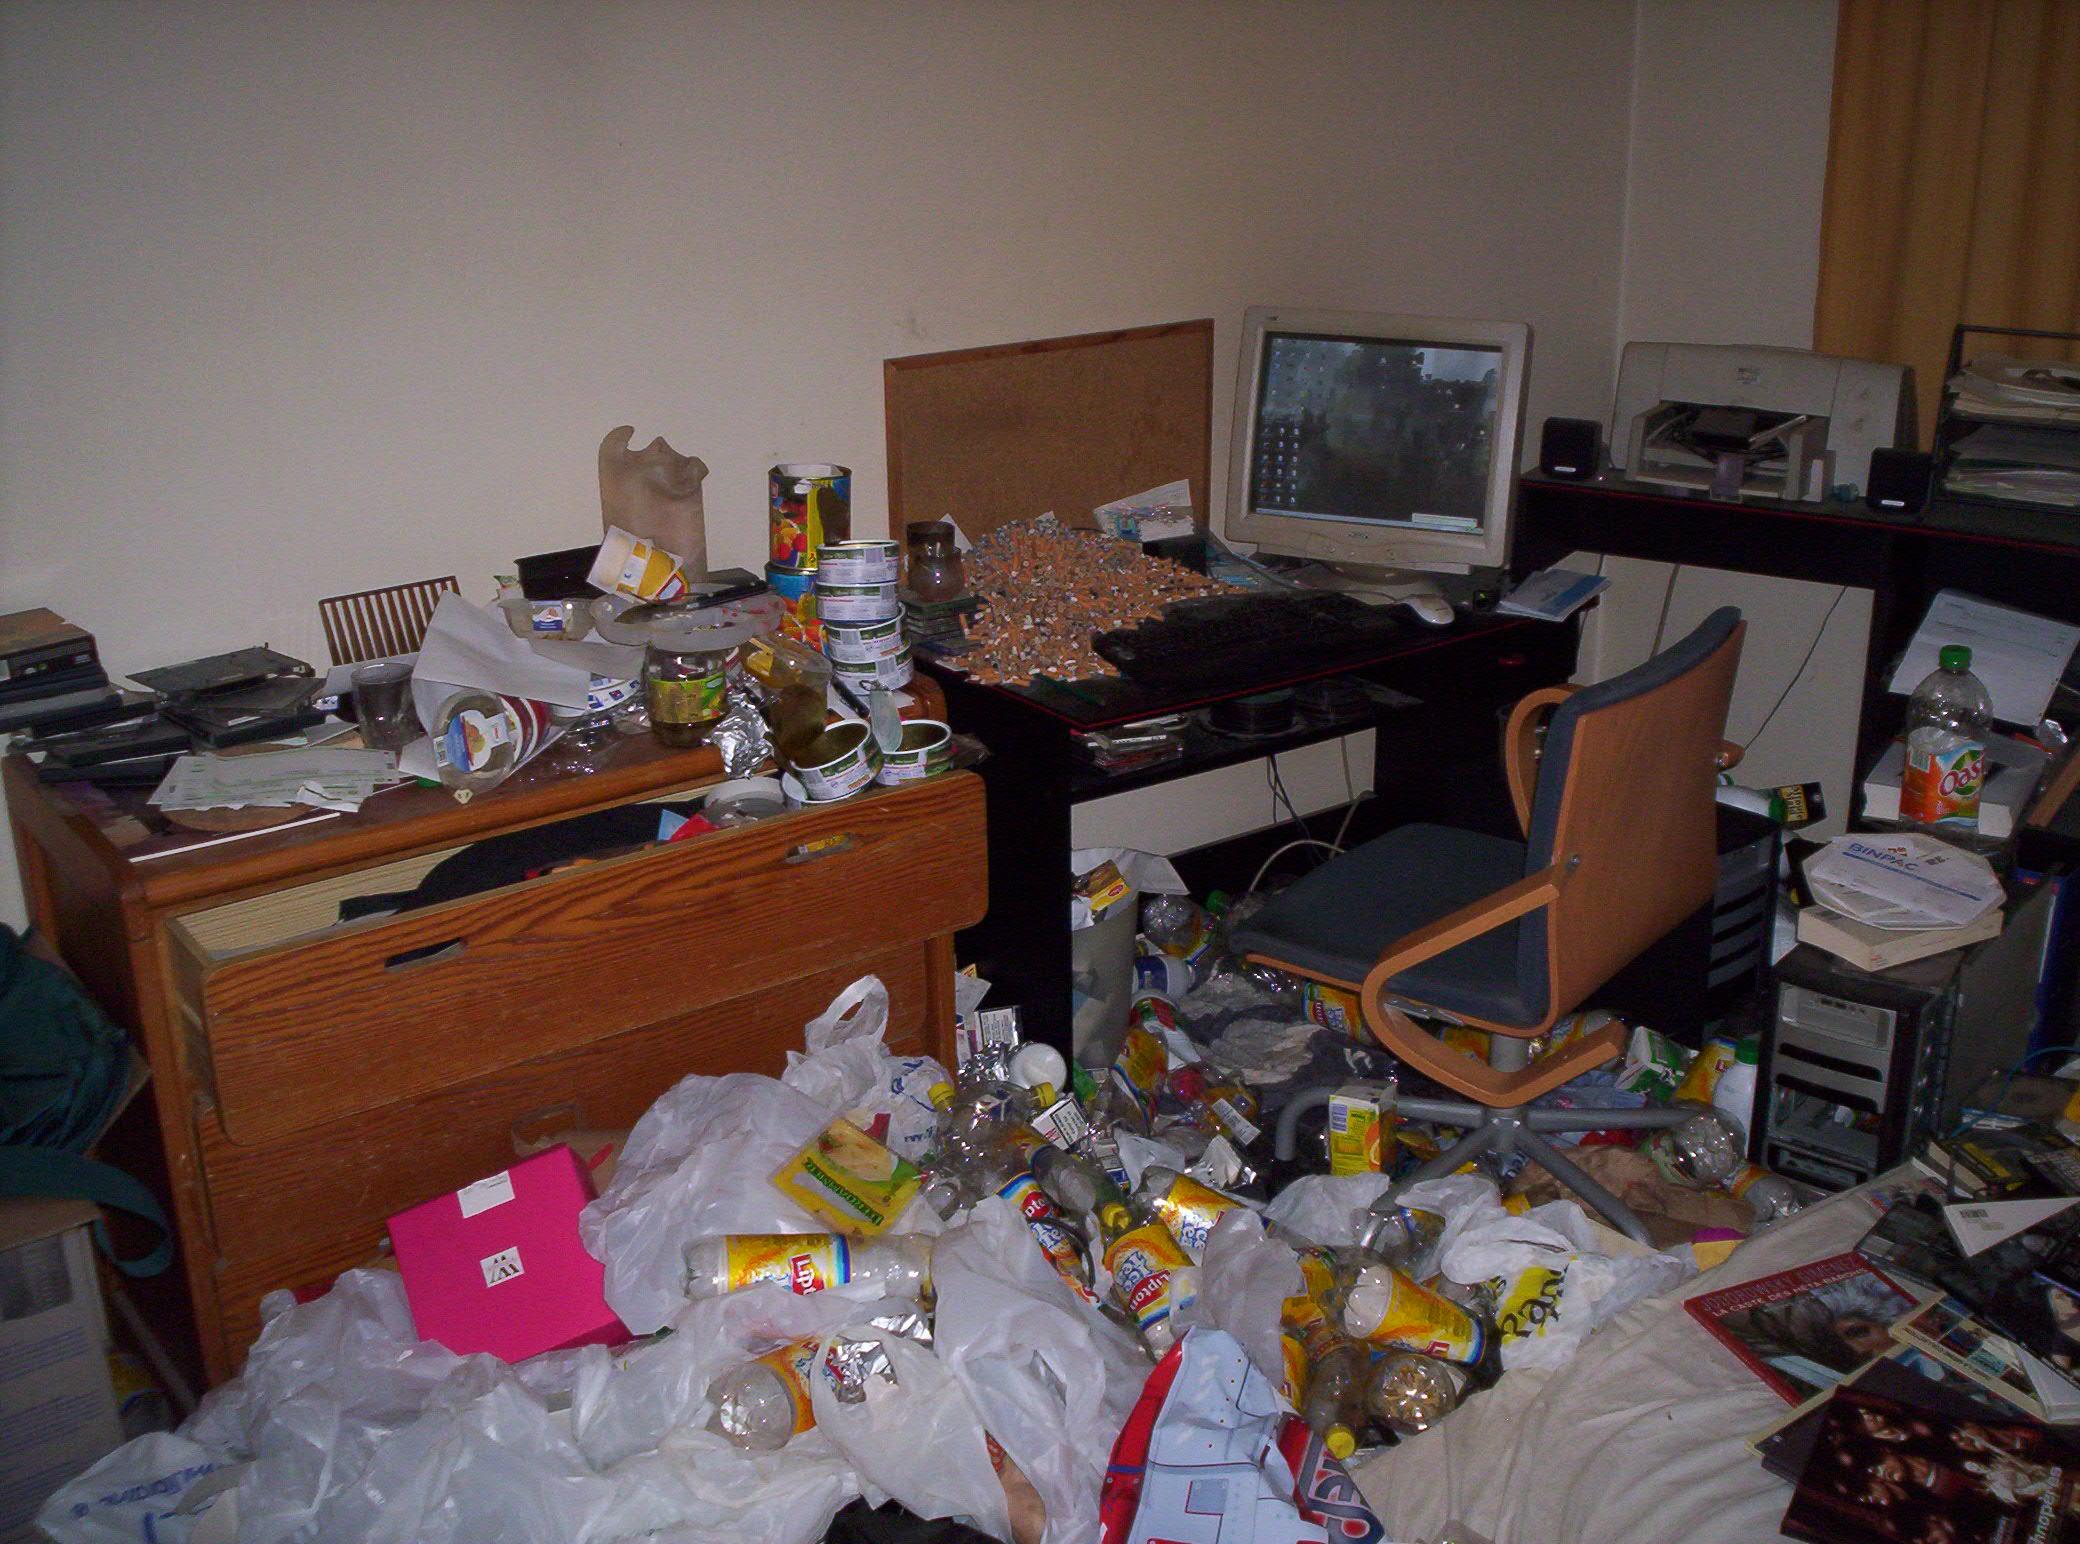 Chambre en bordel - Ranger une chambre en bordel ...